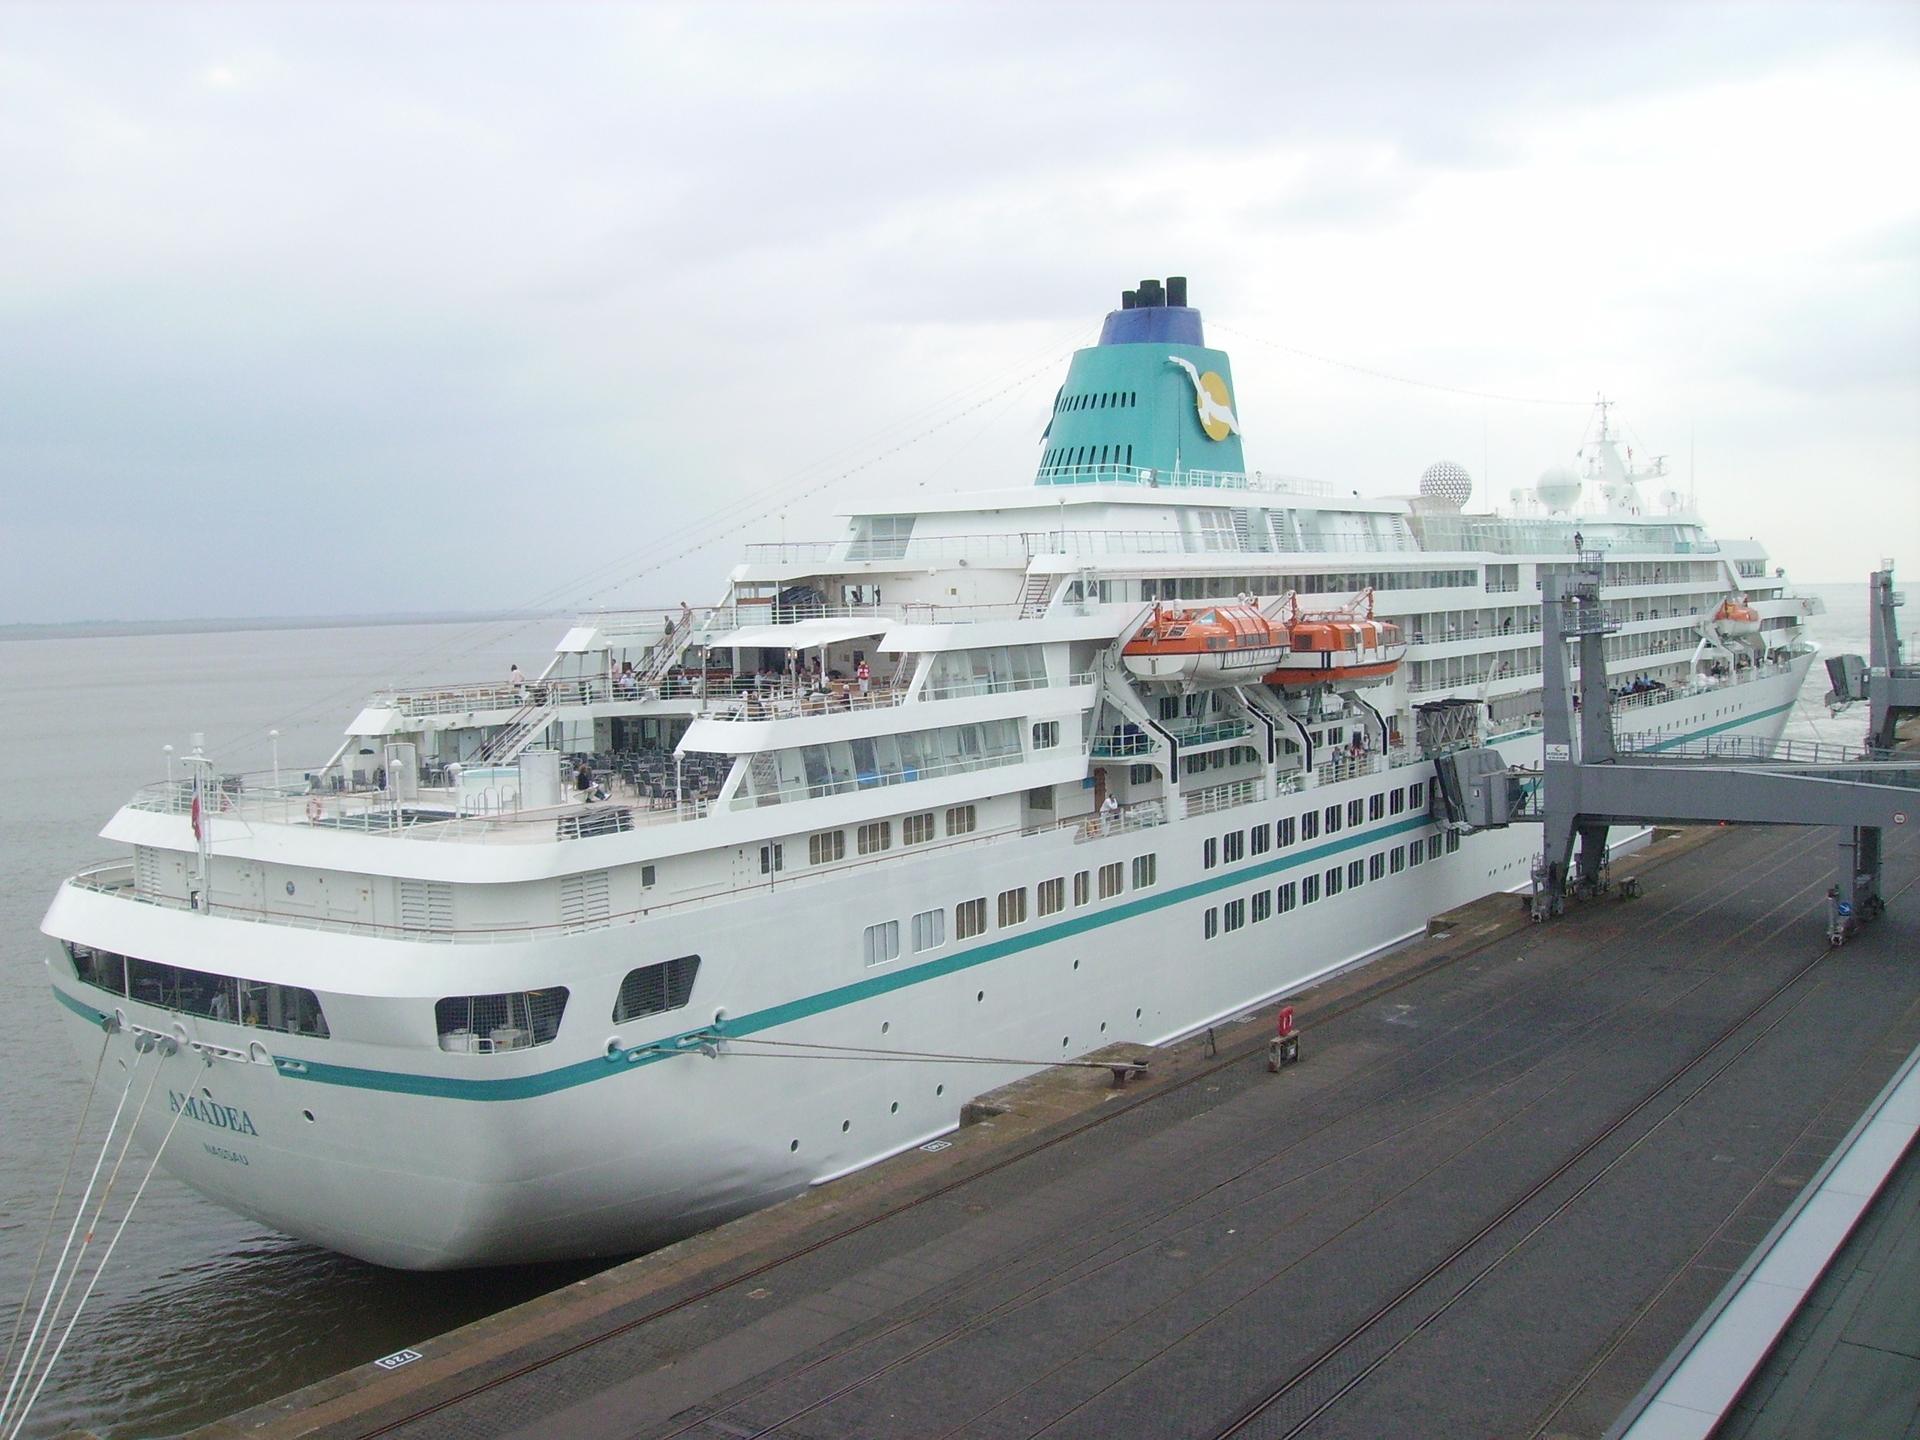 FileCruise Ship Amadeajpg Wikimedia Commons - Cruise ship amadea